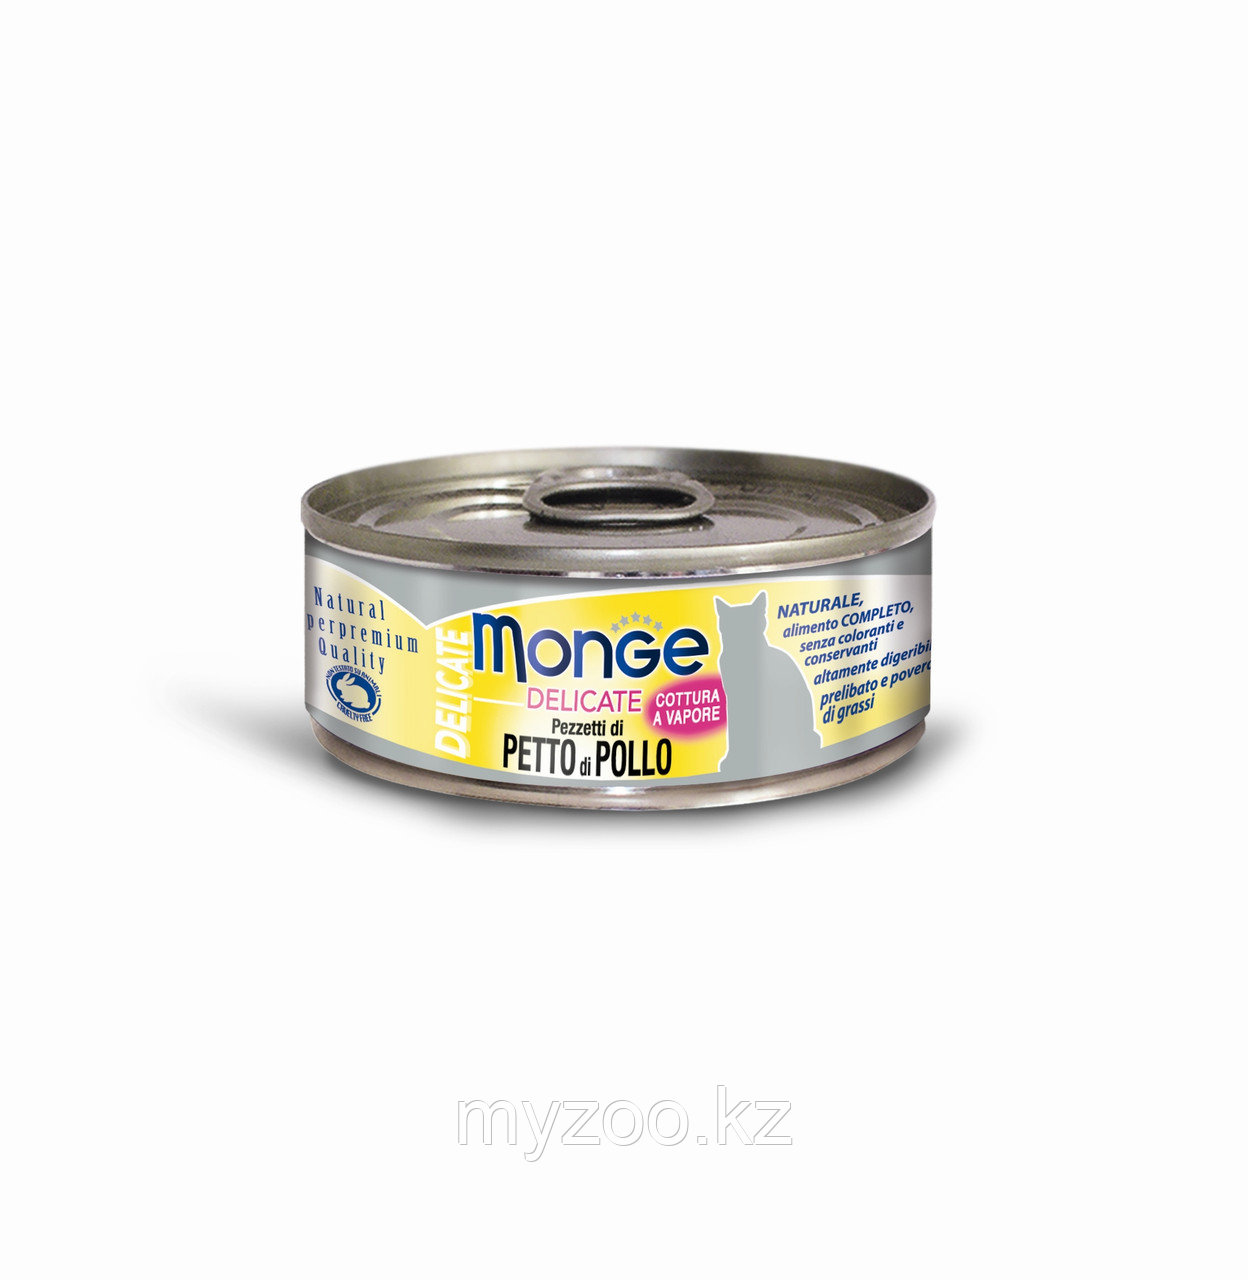 Monge Cat Delicate, Монже Деликэйт, 80 гр Кусочки для кошек с курицей